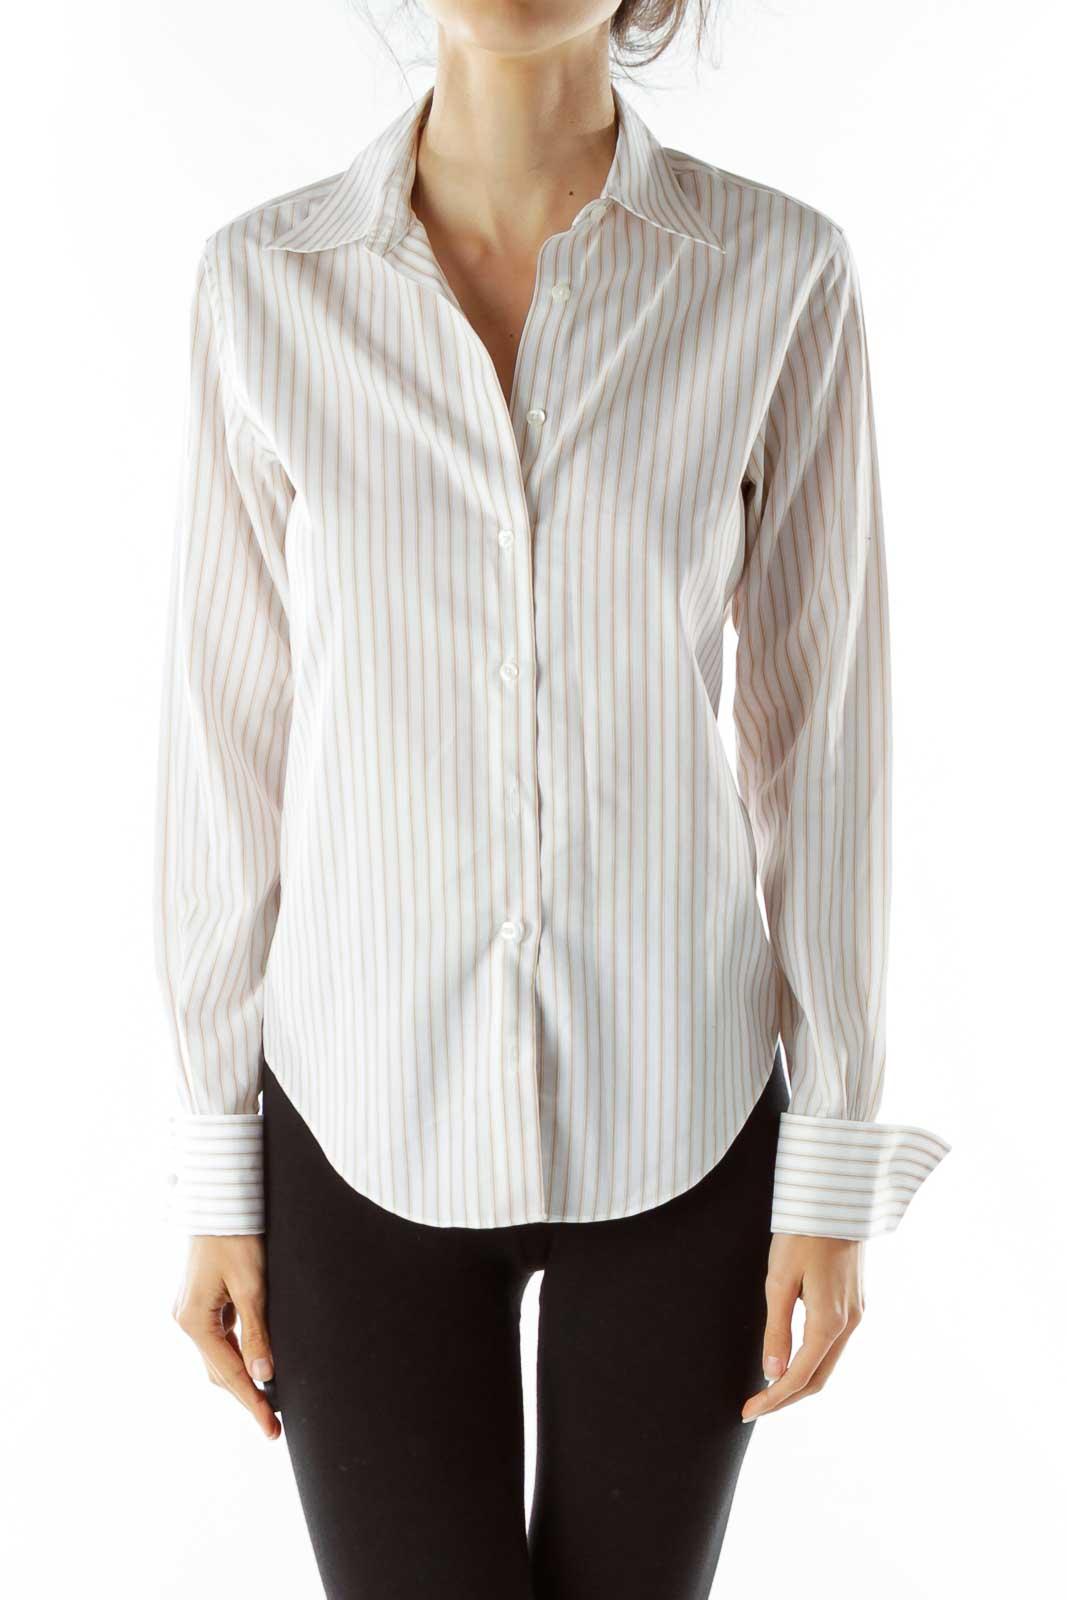 White Beige Striped Shirt